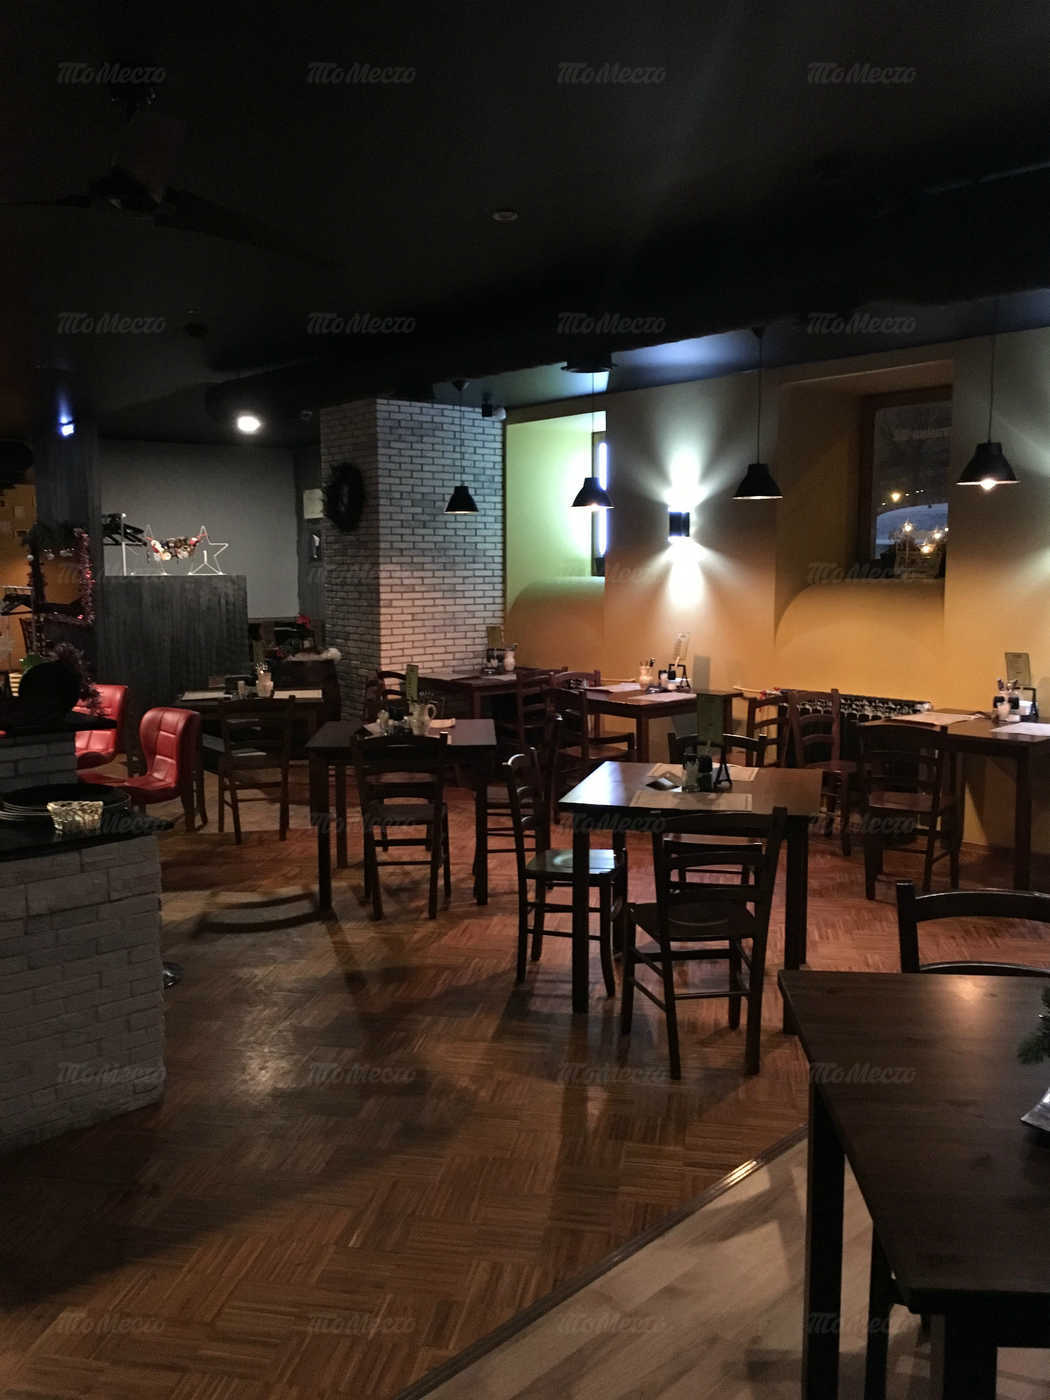 Ресторан The Батя (The Batya) на набережной реки Фонтанки